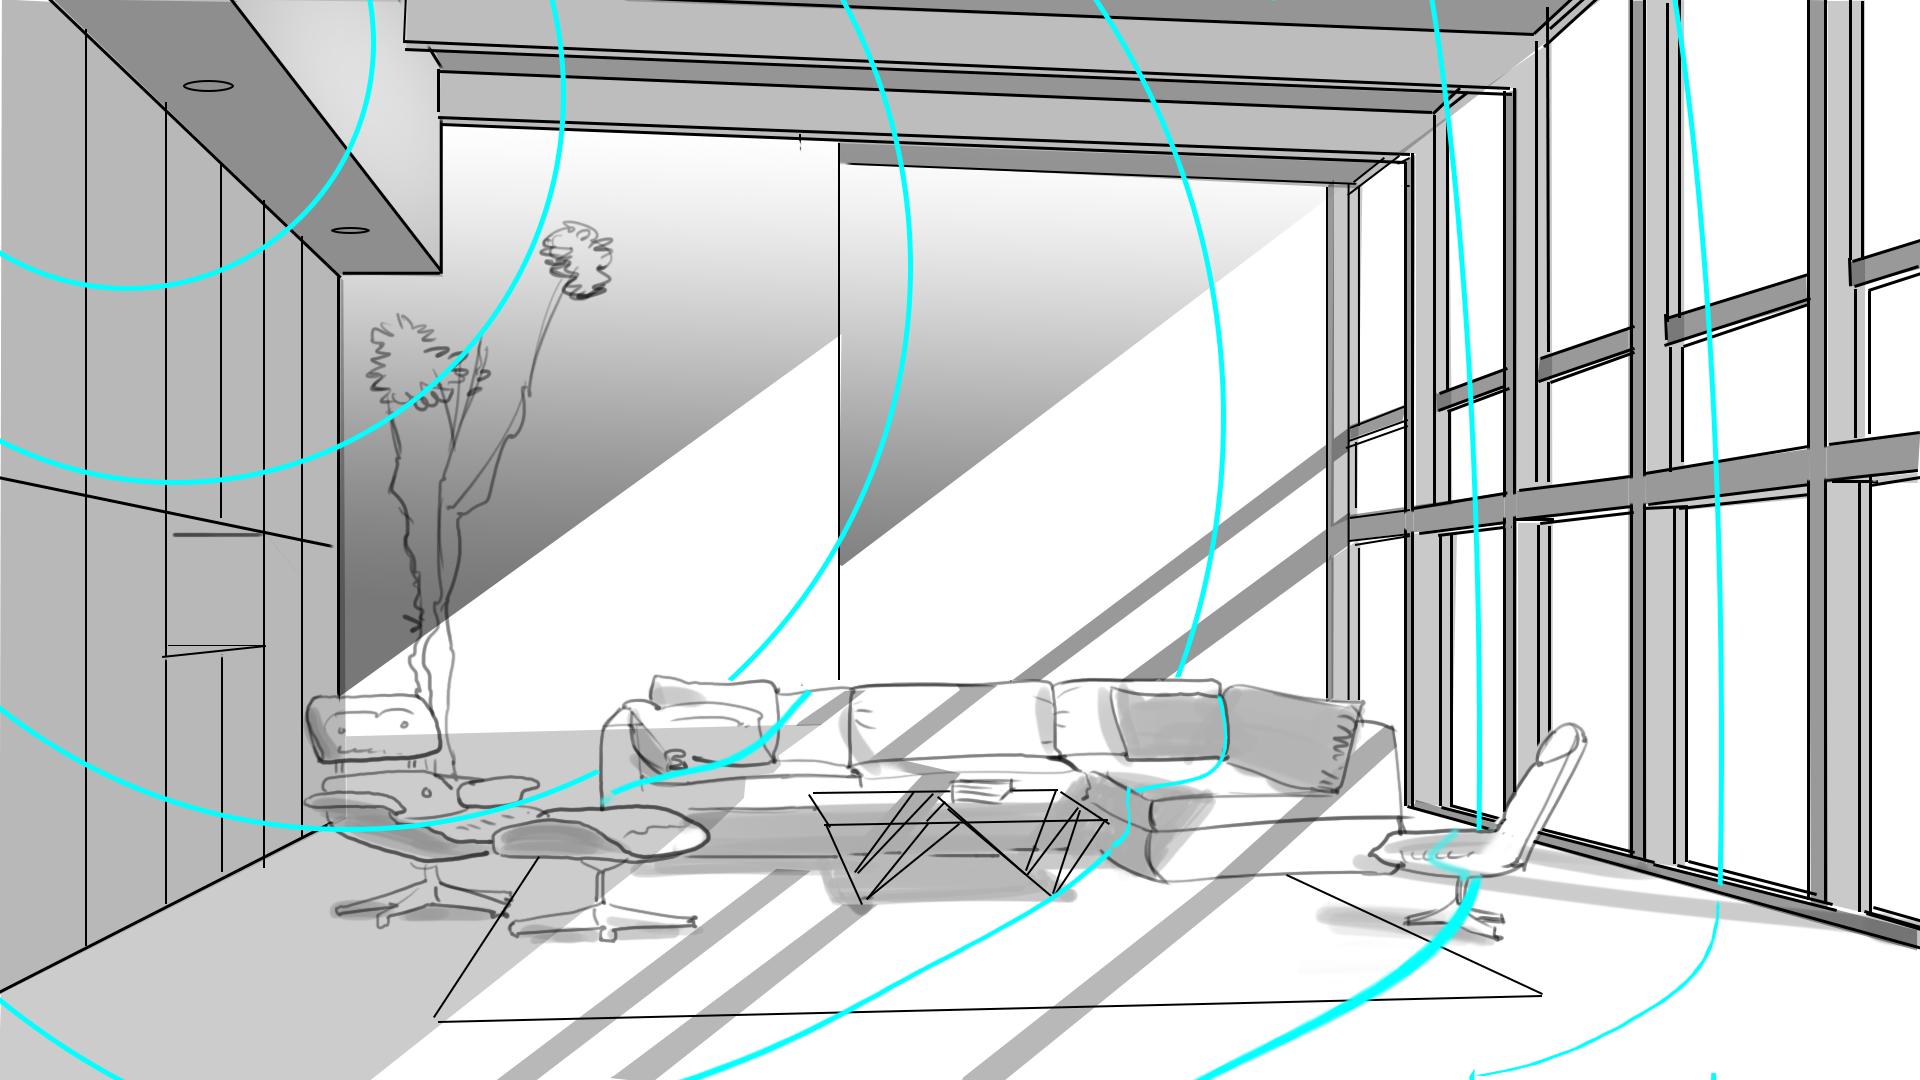 008_Fios_Orbi_living room.png